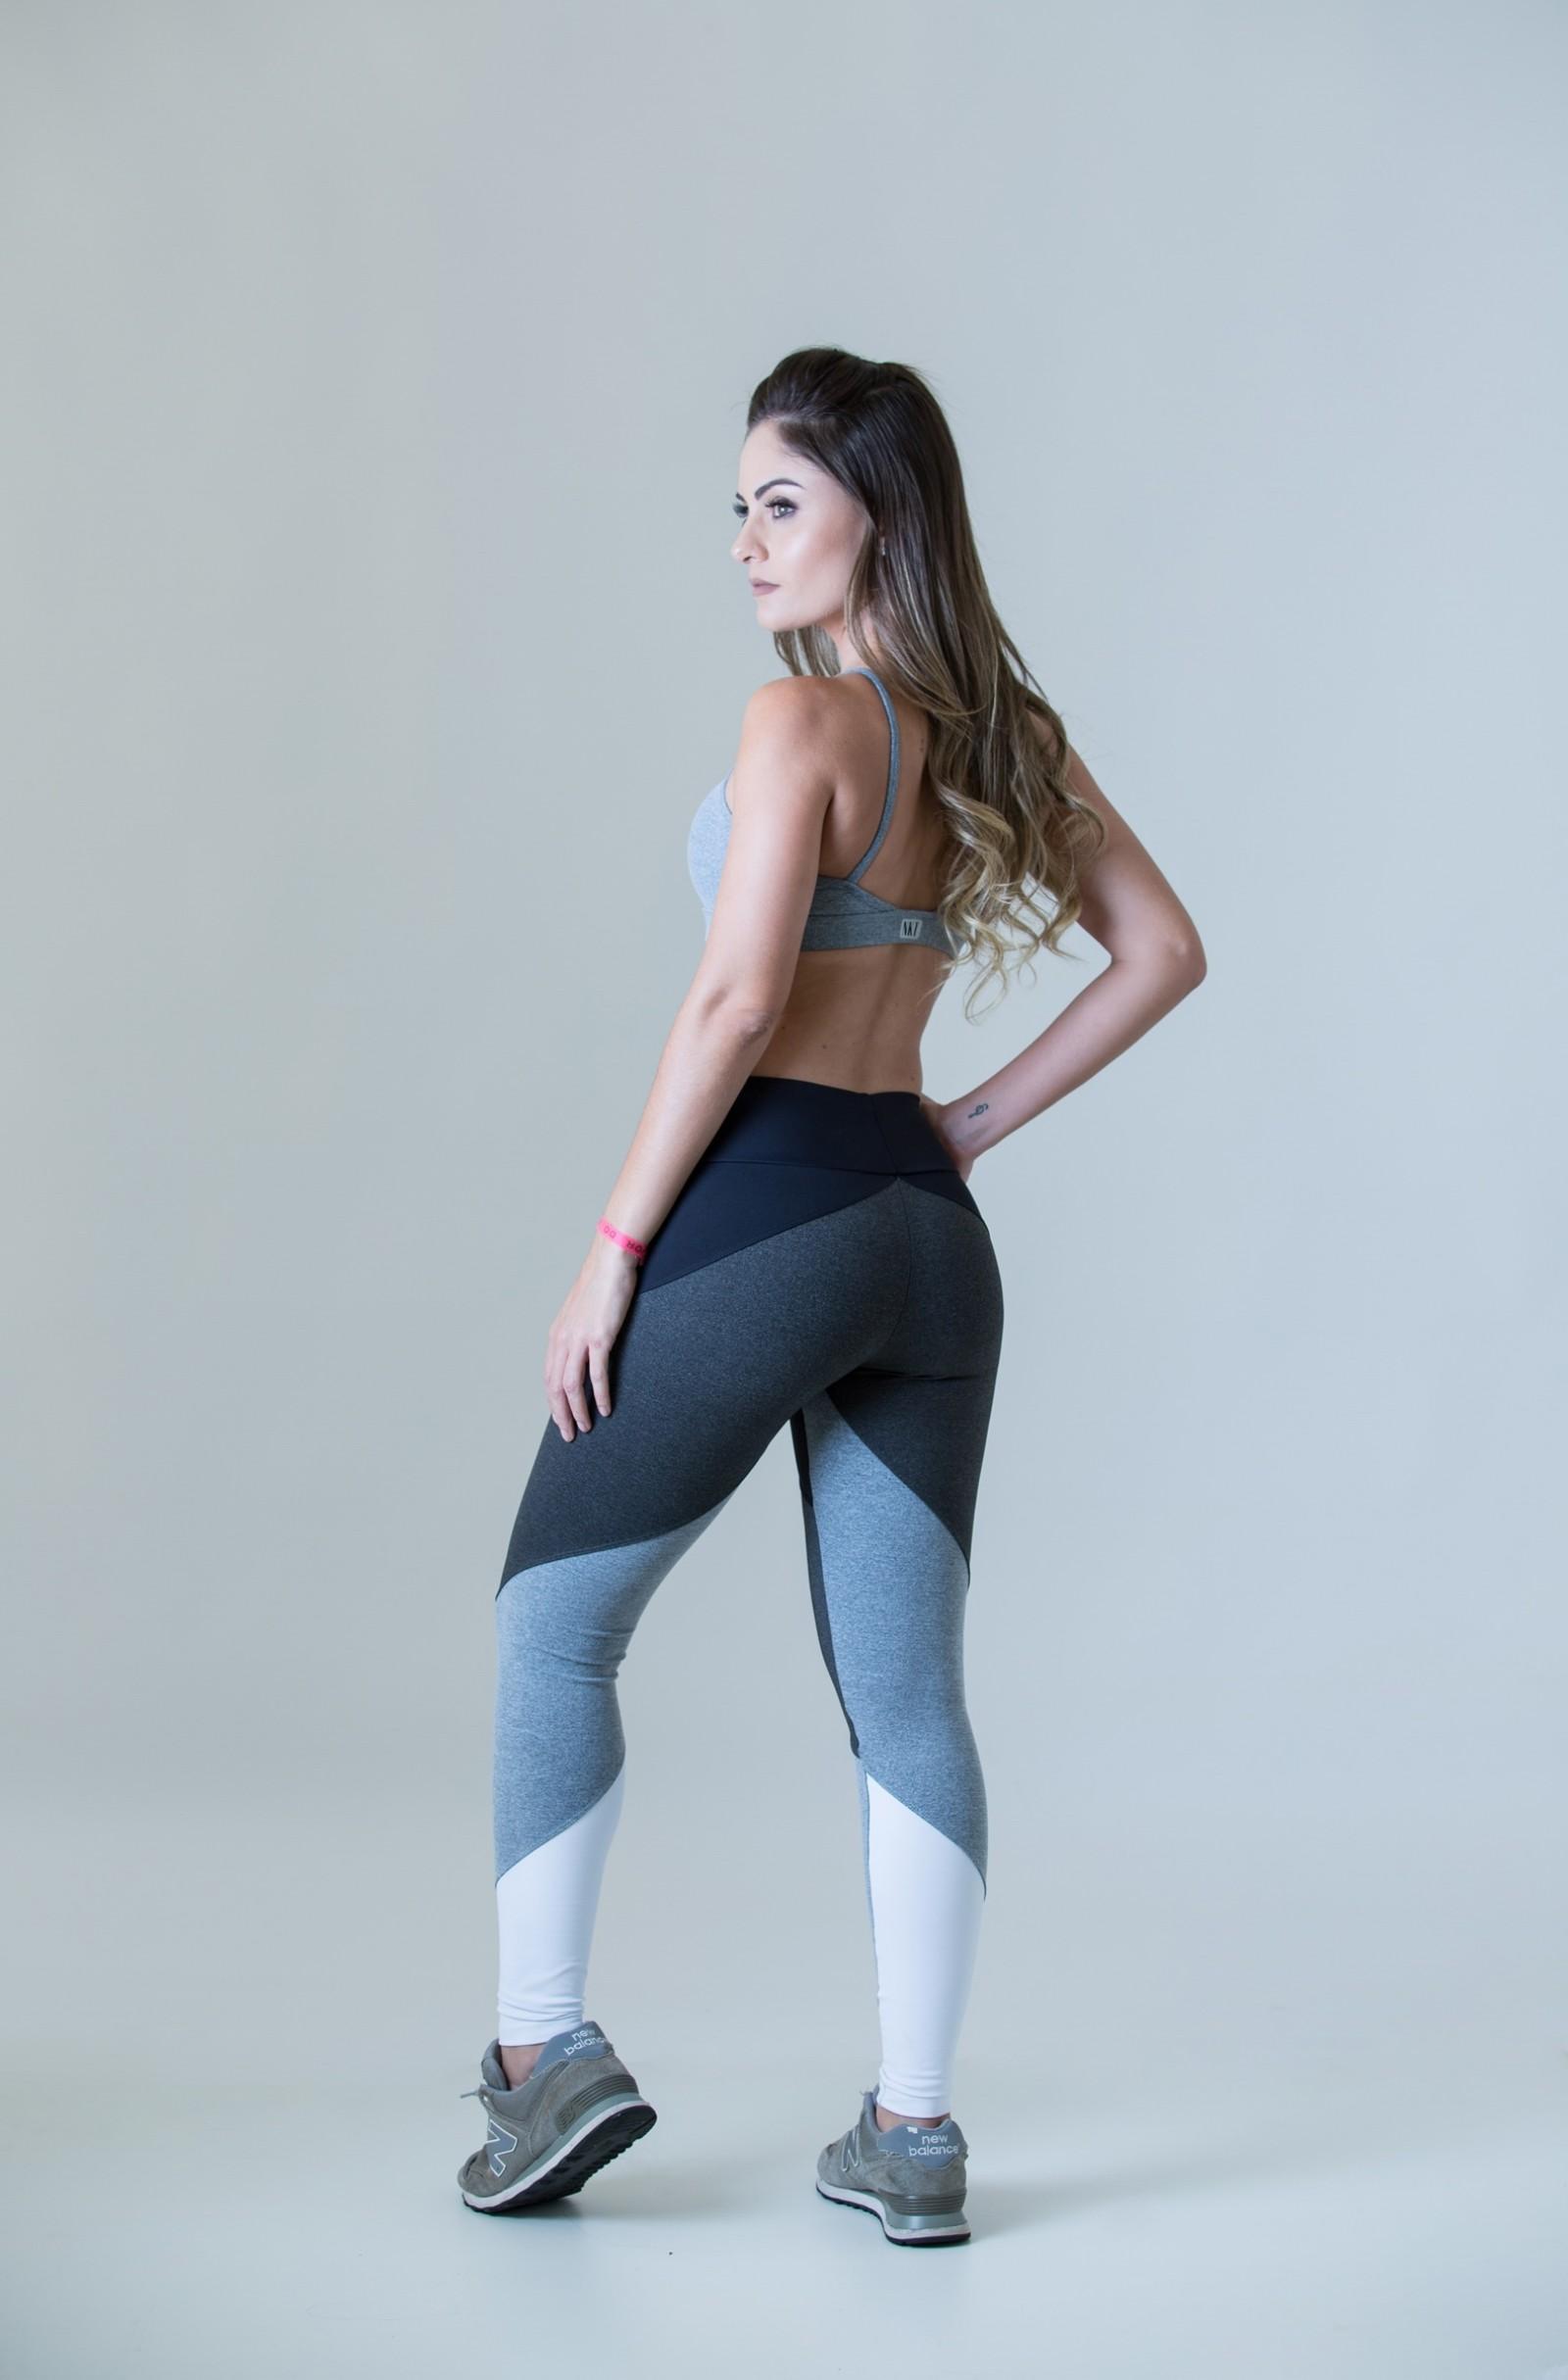 Legging Profusion Mescla, Coleção Plenitude - NKT Fitwear Moda Fitness